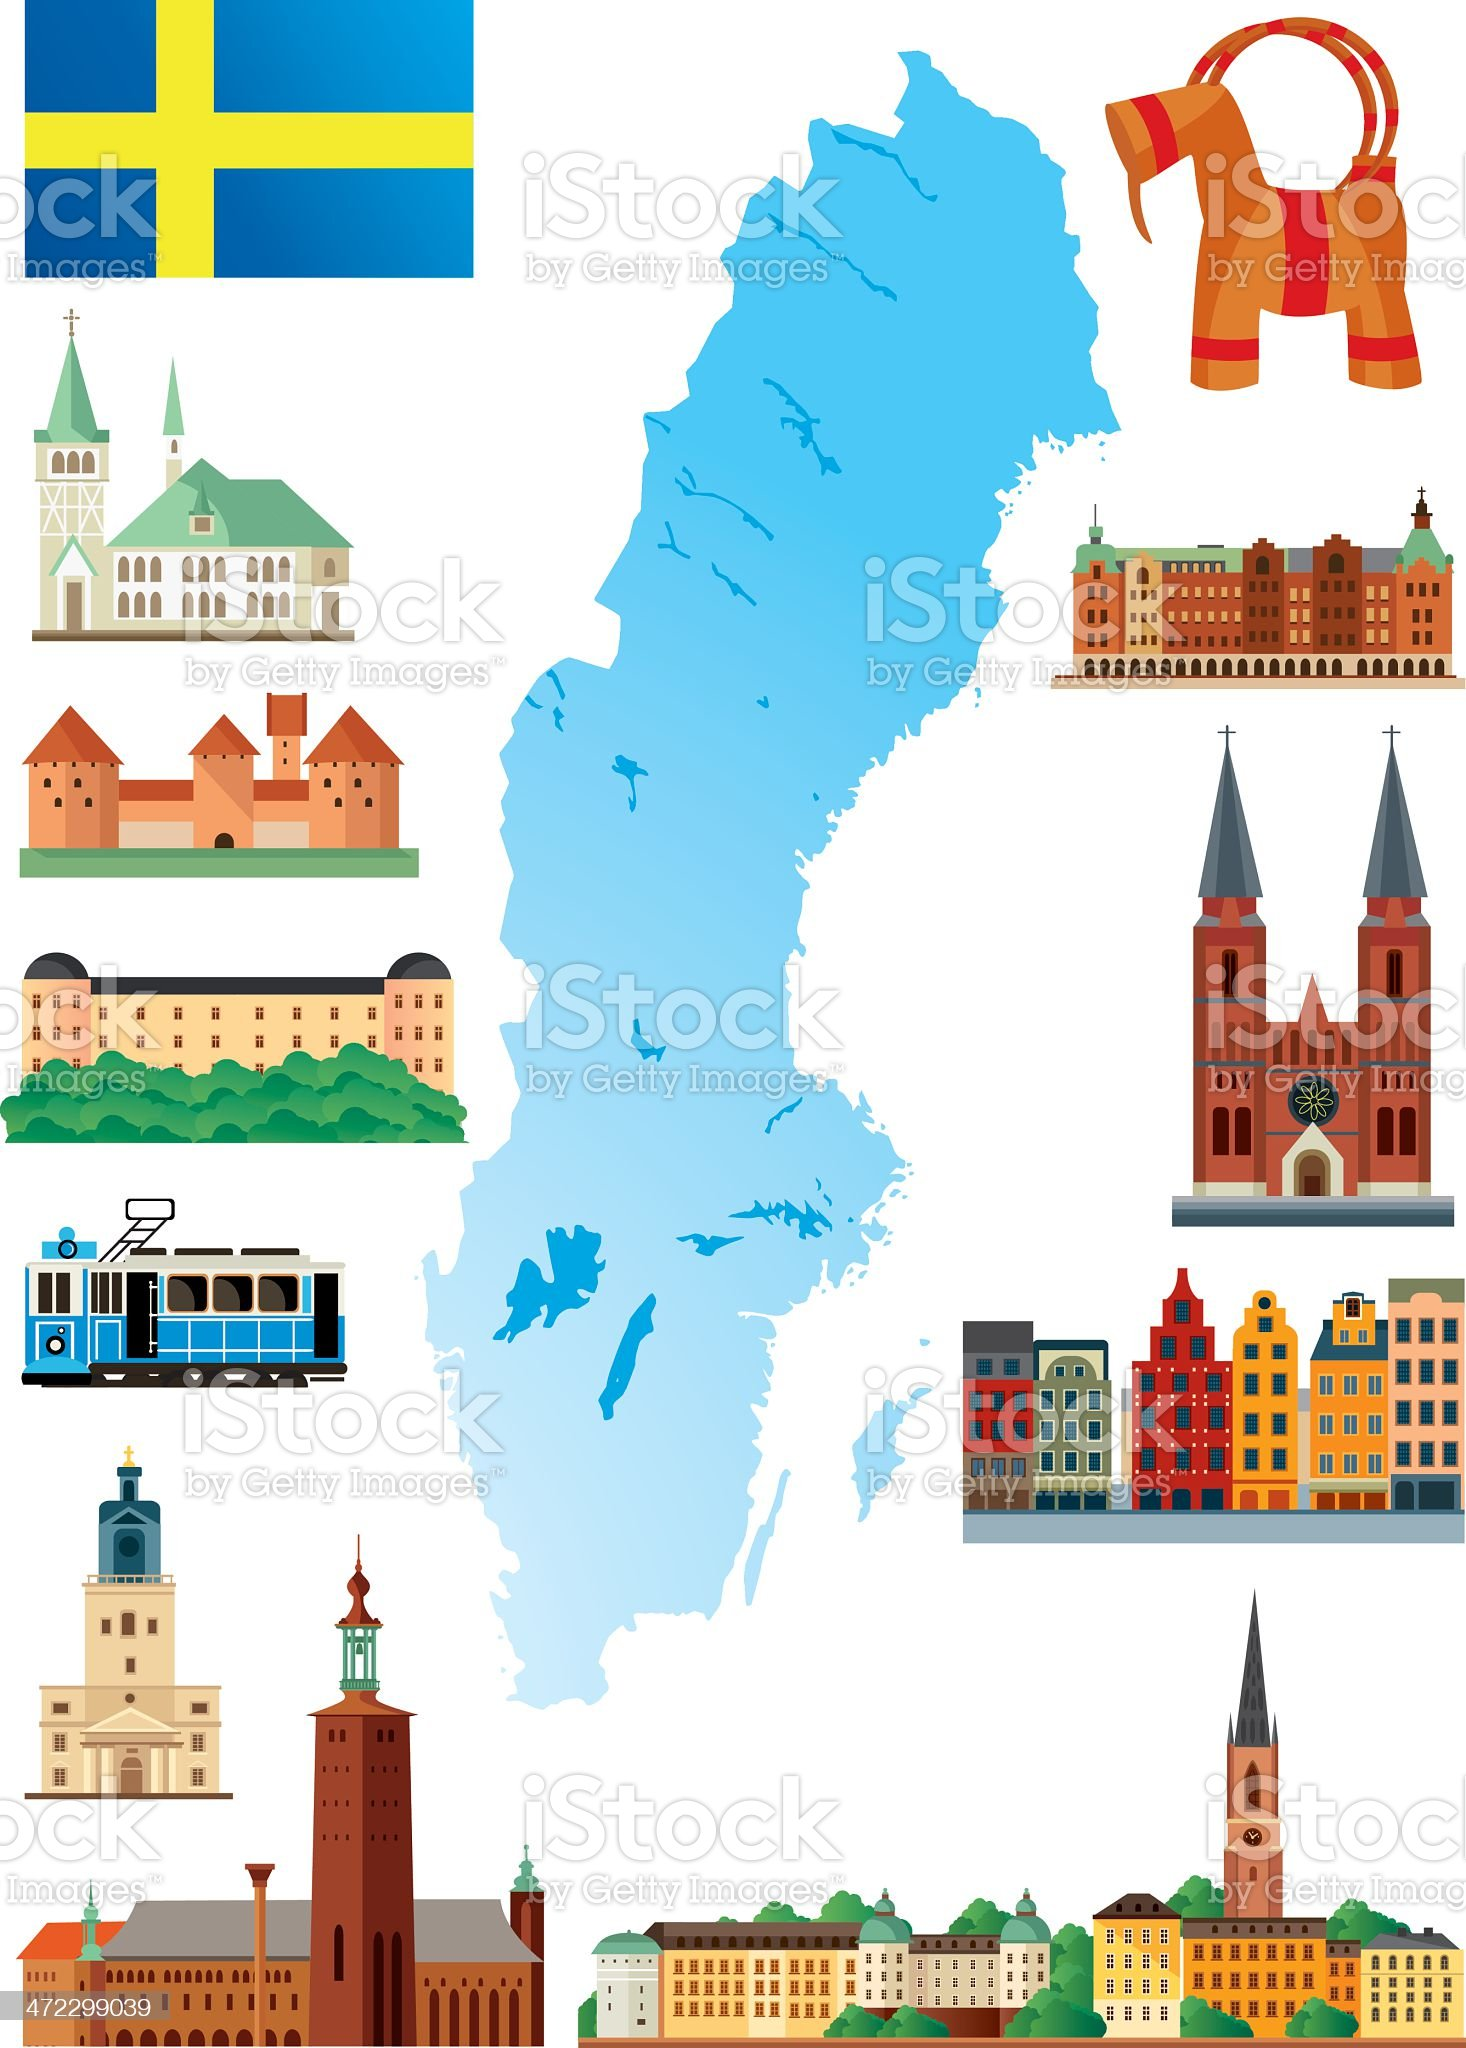 Sweden royalty-free stock vector art